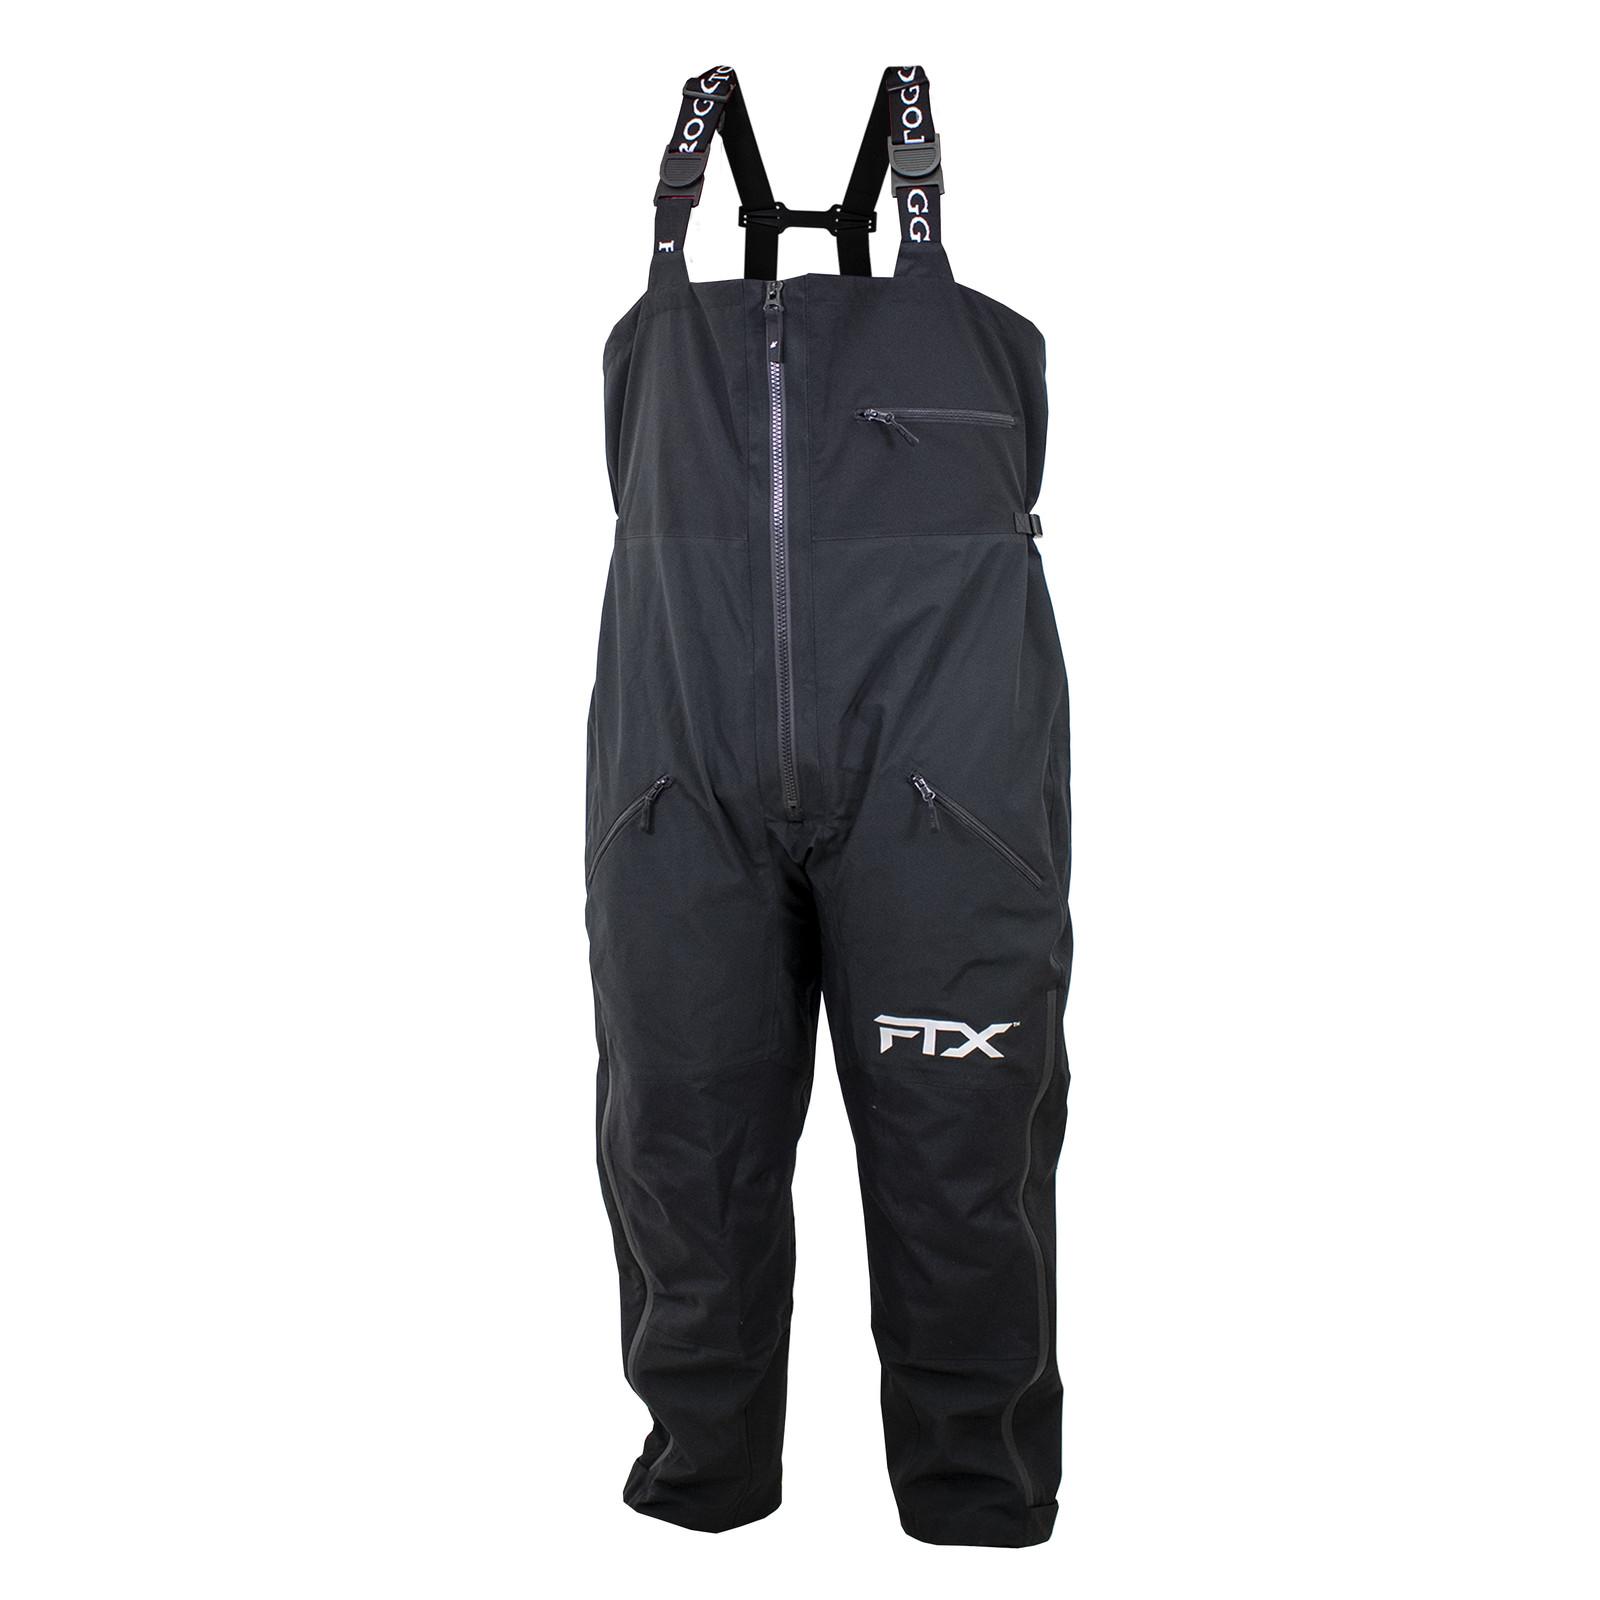 Black FTX Armor Bib-large